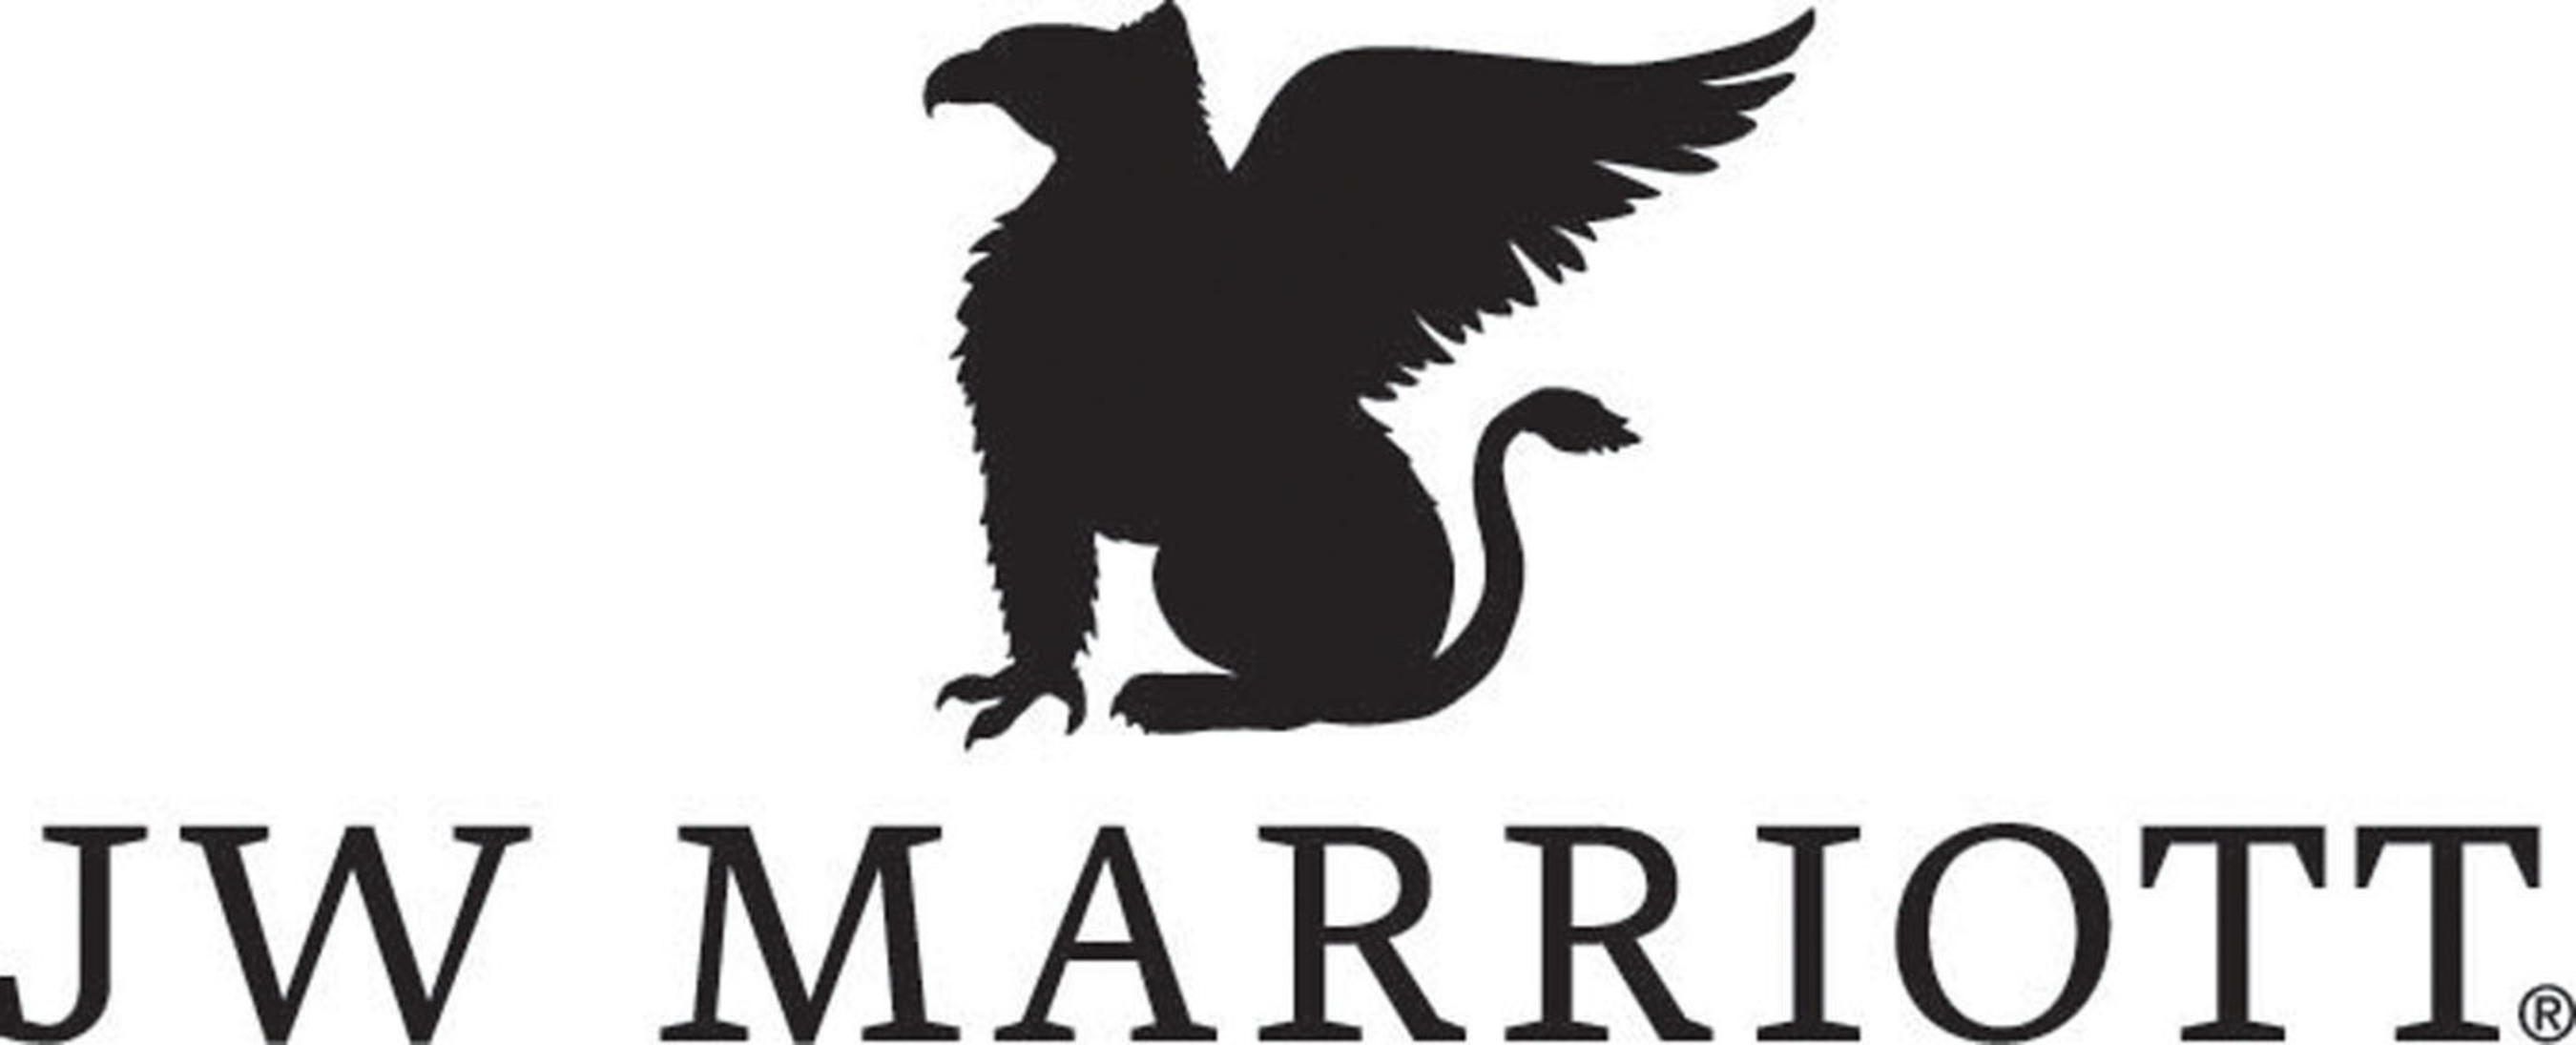 JW Marriott Hotels & Resorts.